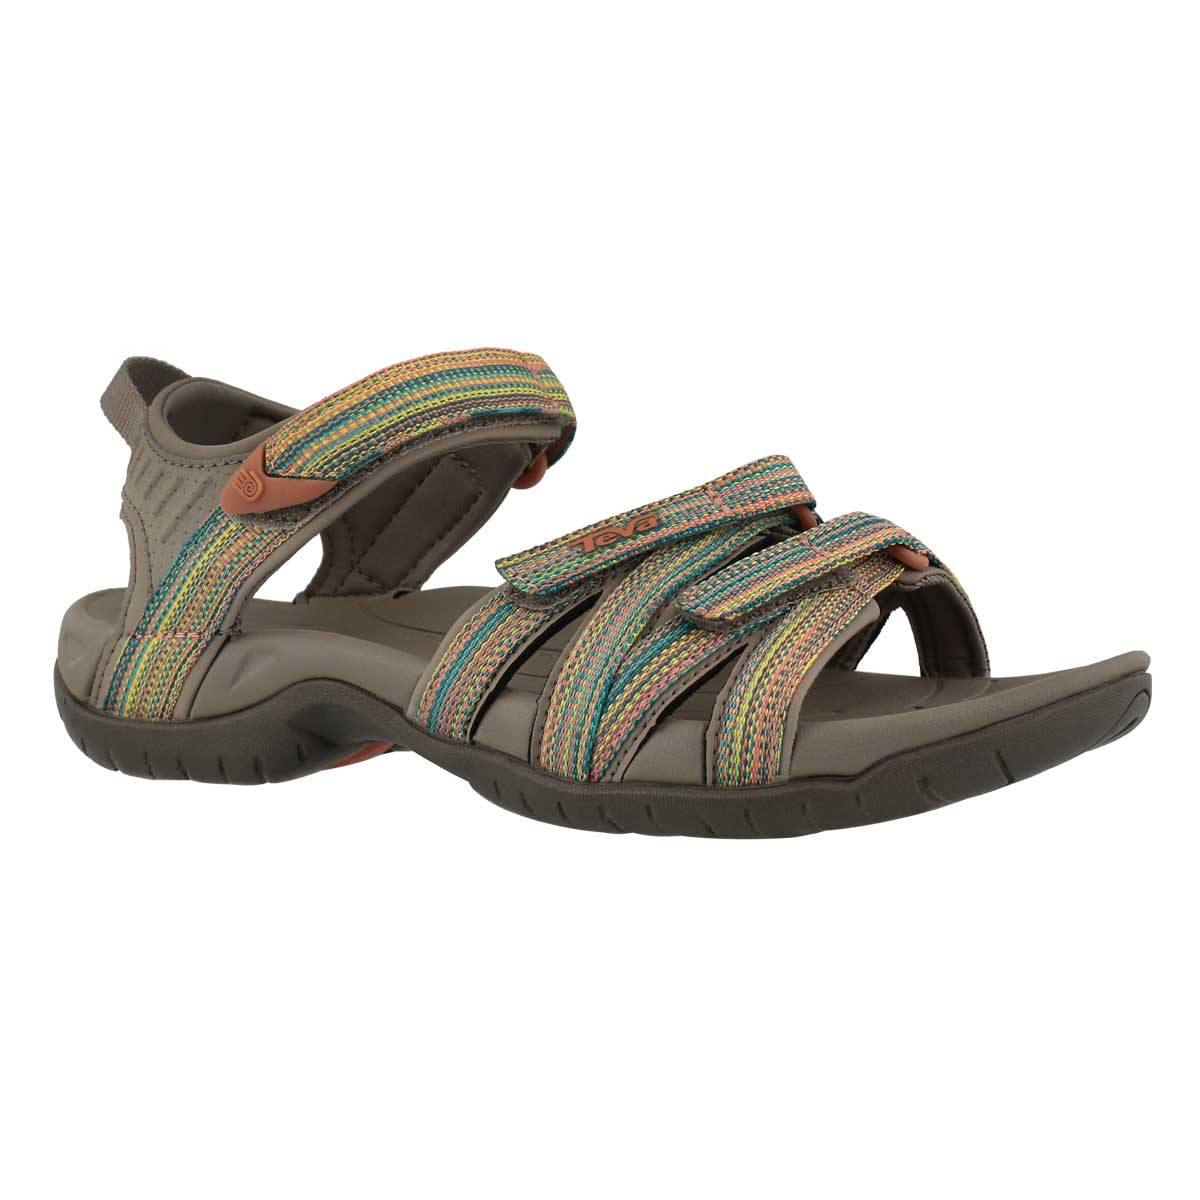 Women's TIRRA taupe multi sport sandals